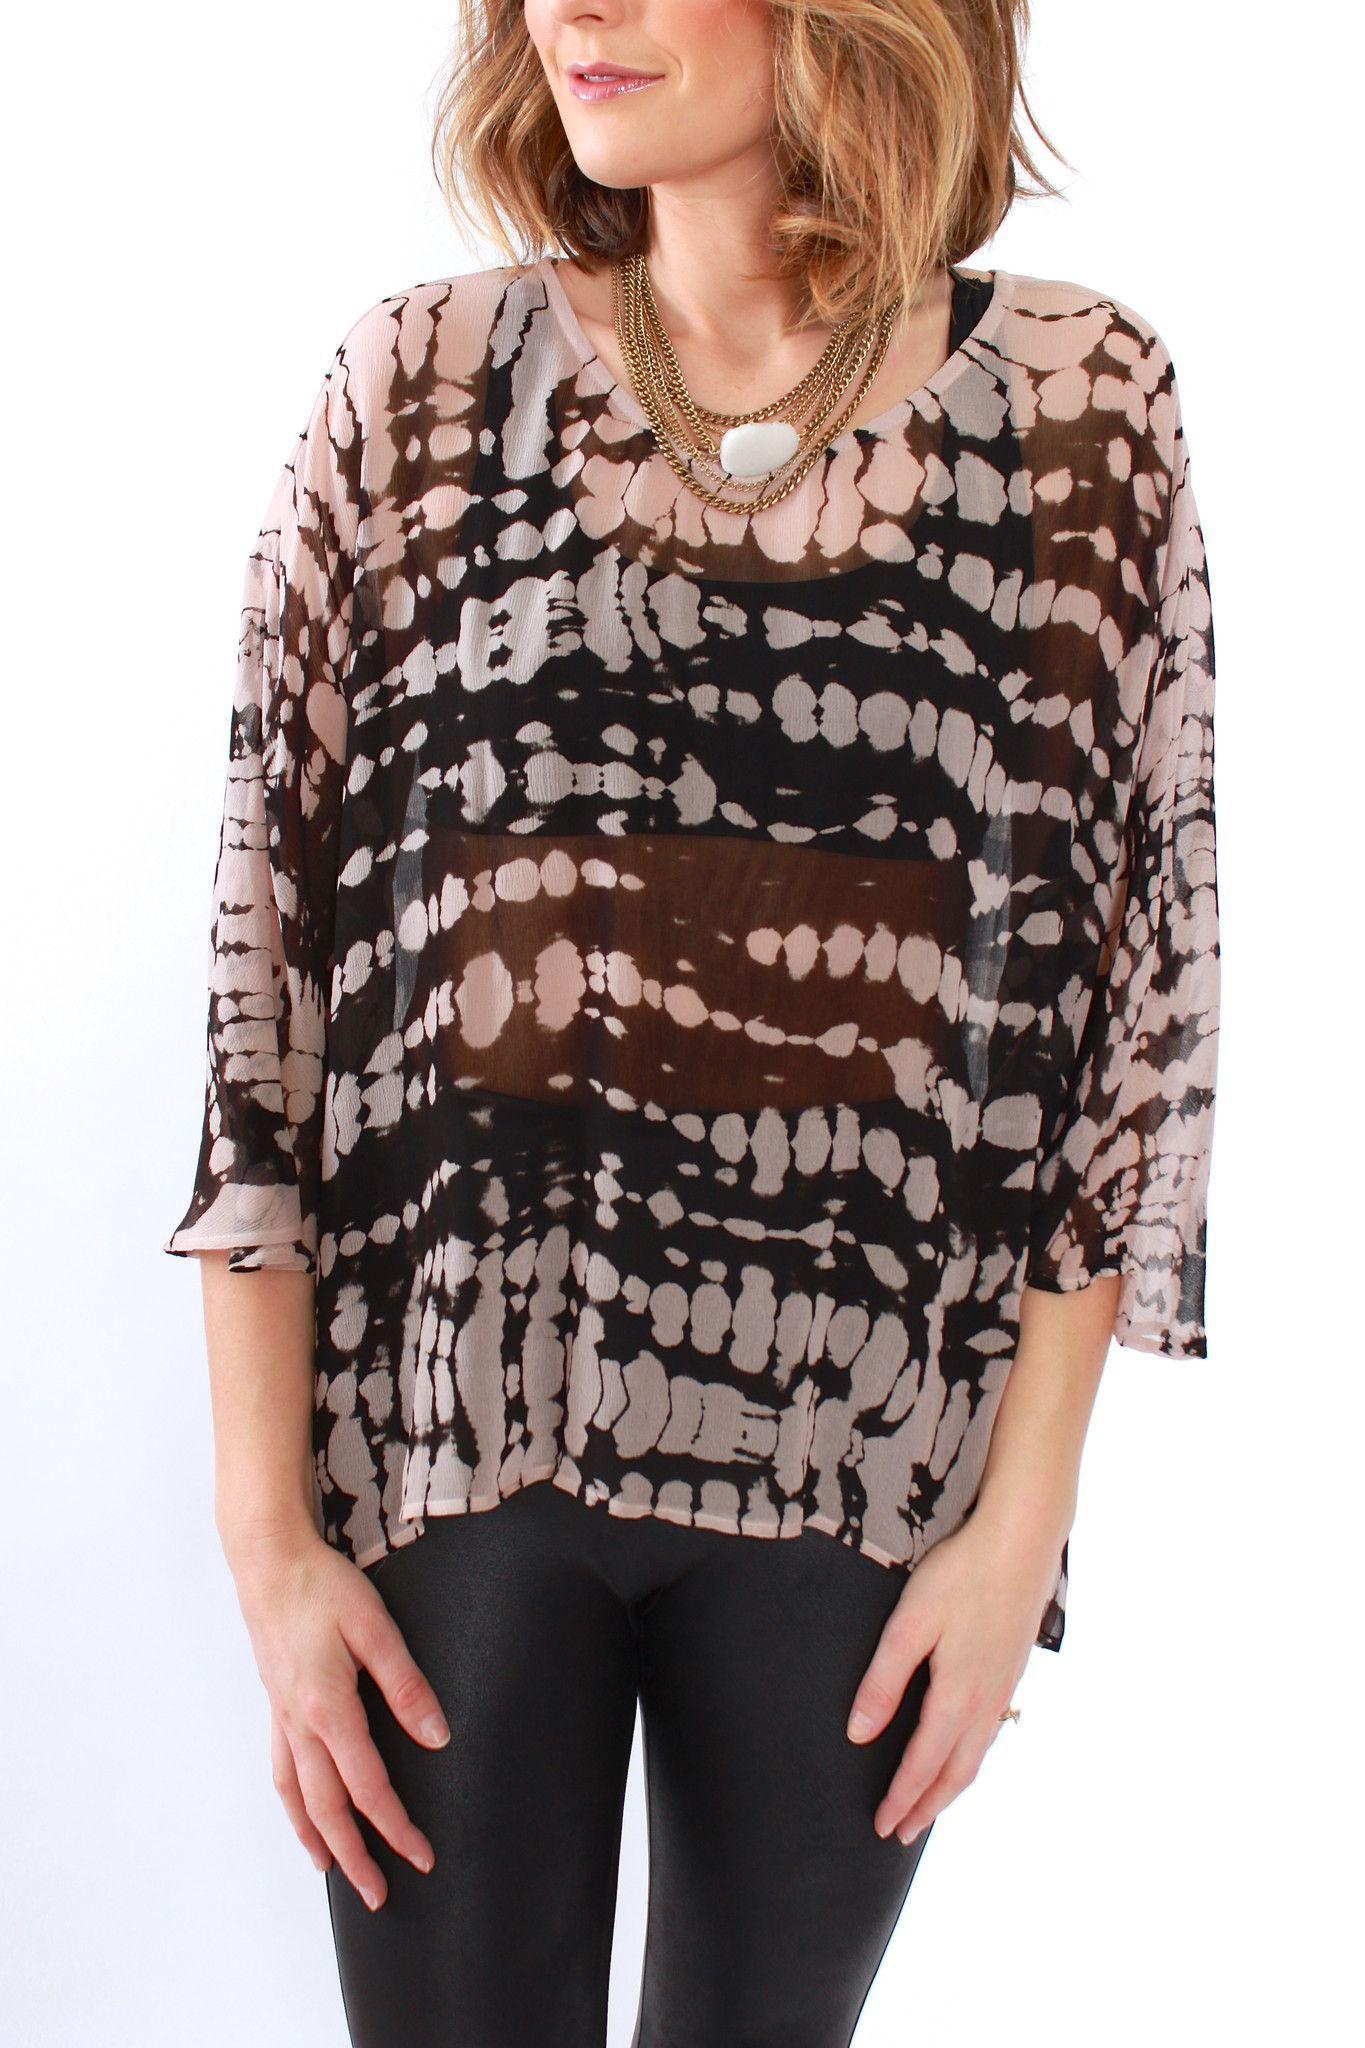 Gypsy, Silk Tie-Dye Blouse from Viva Diva Boutique